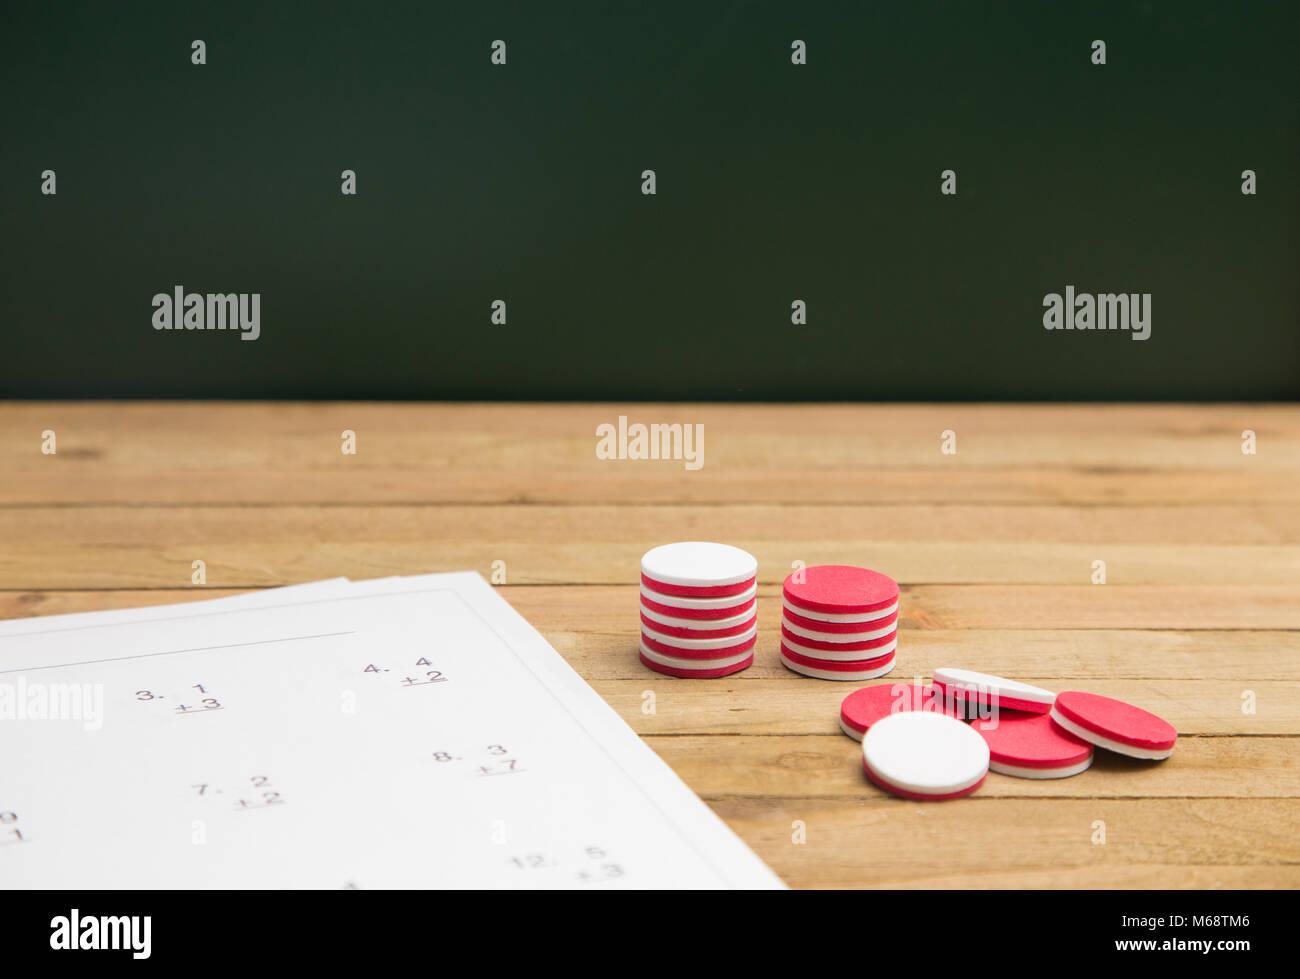 Math Worksheet Stockfotos & Math Worksheet Bilder - Alamy